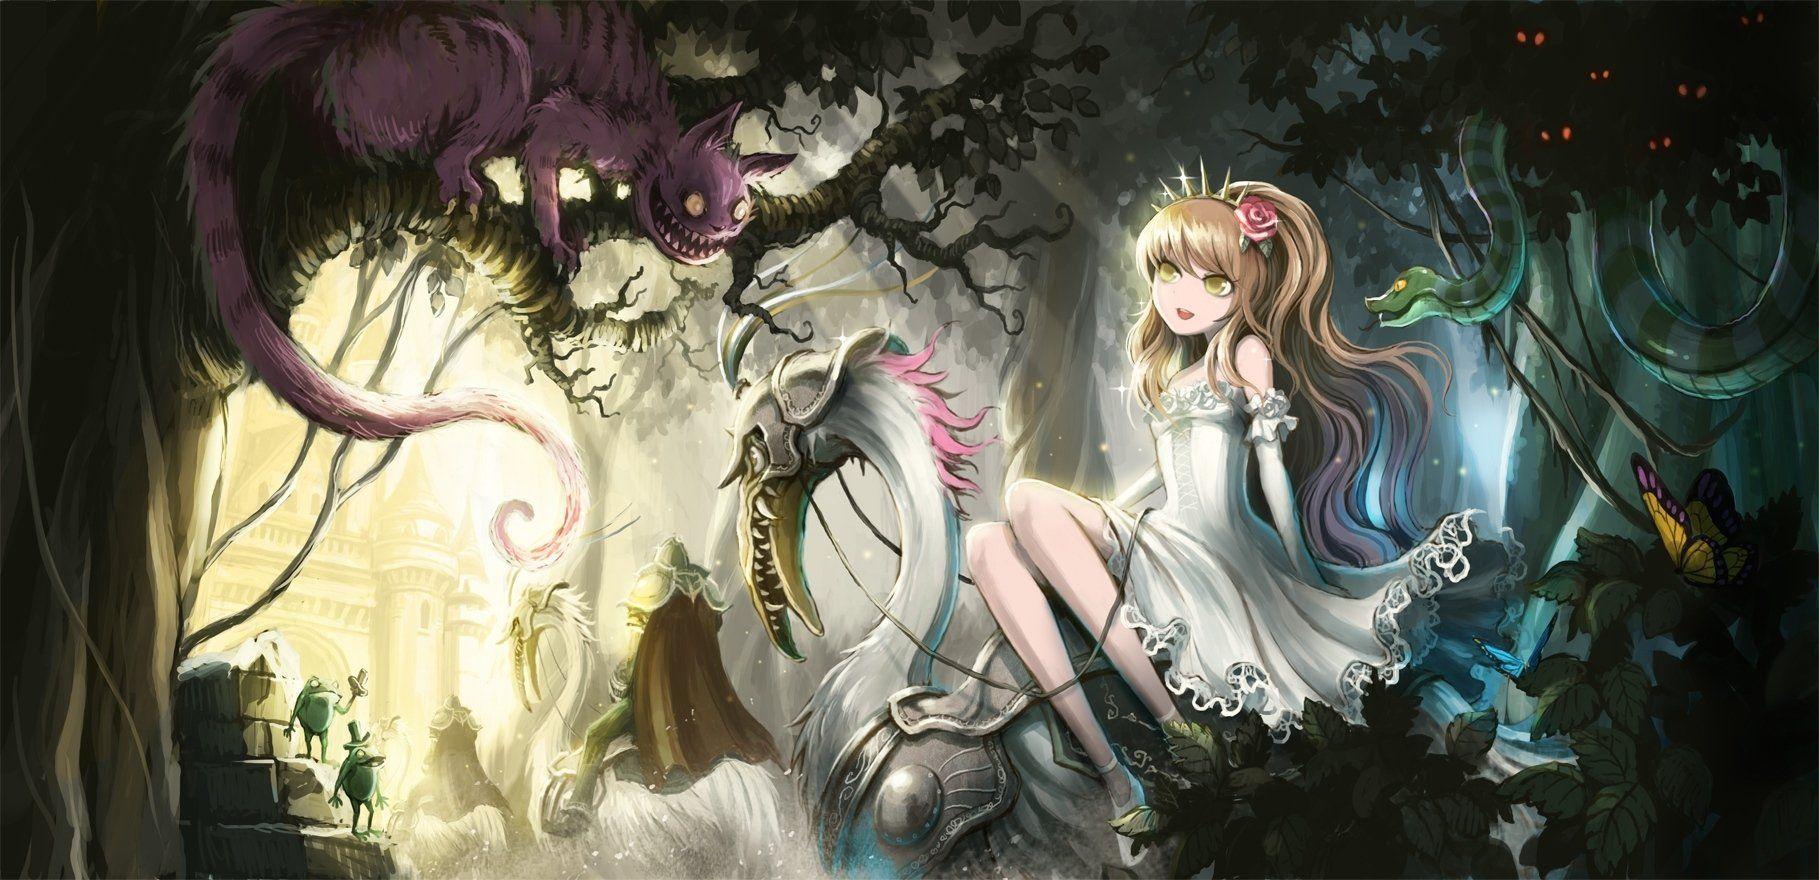 Alice In Wonderland Wallpaper For Walls Искусство, Рисунки